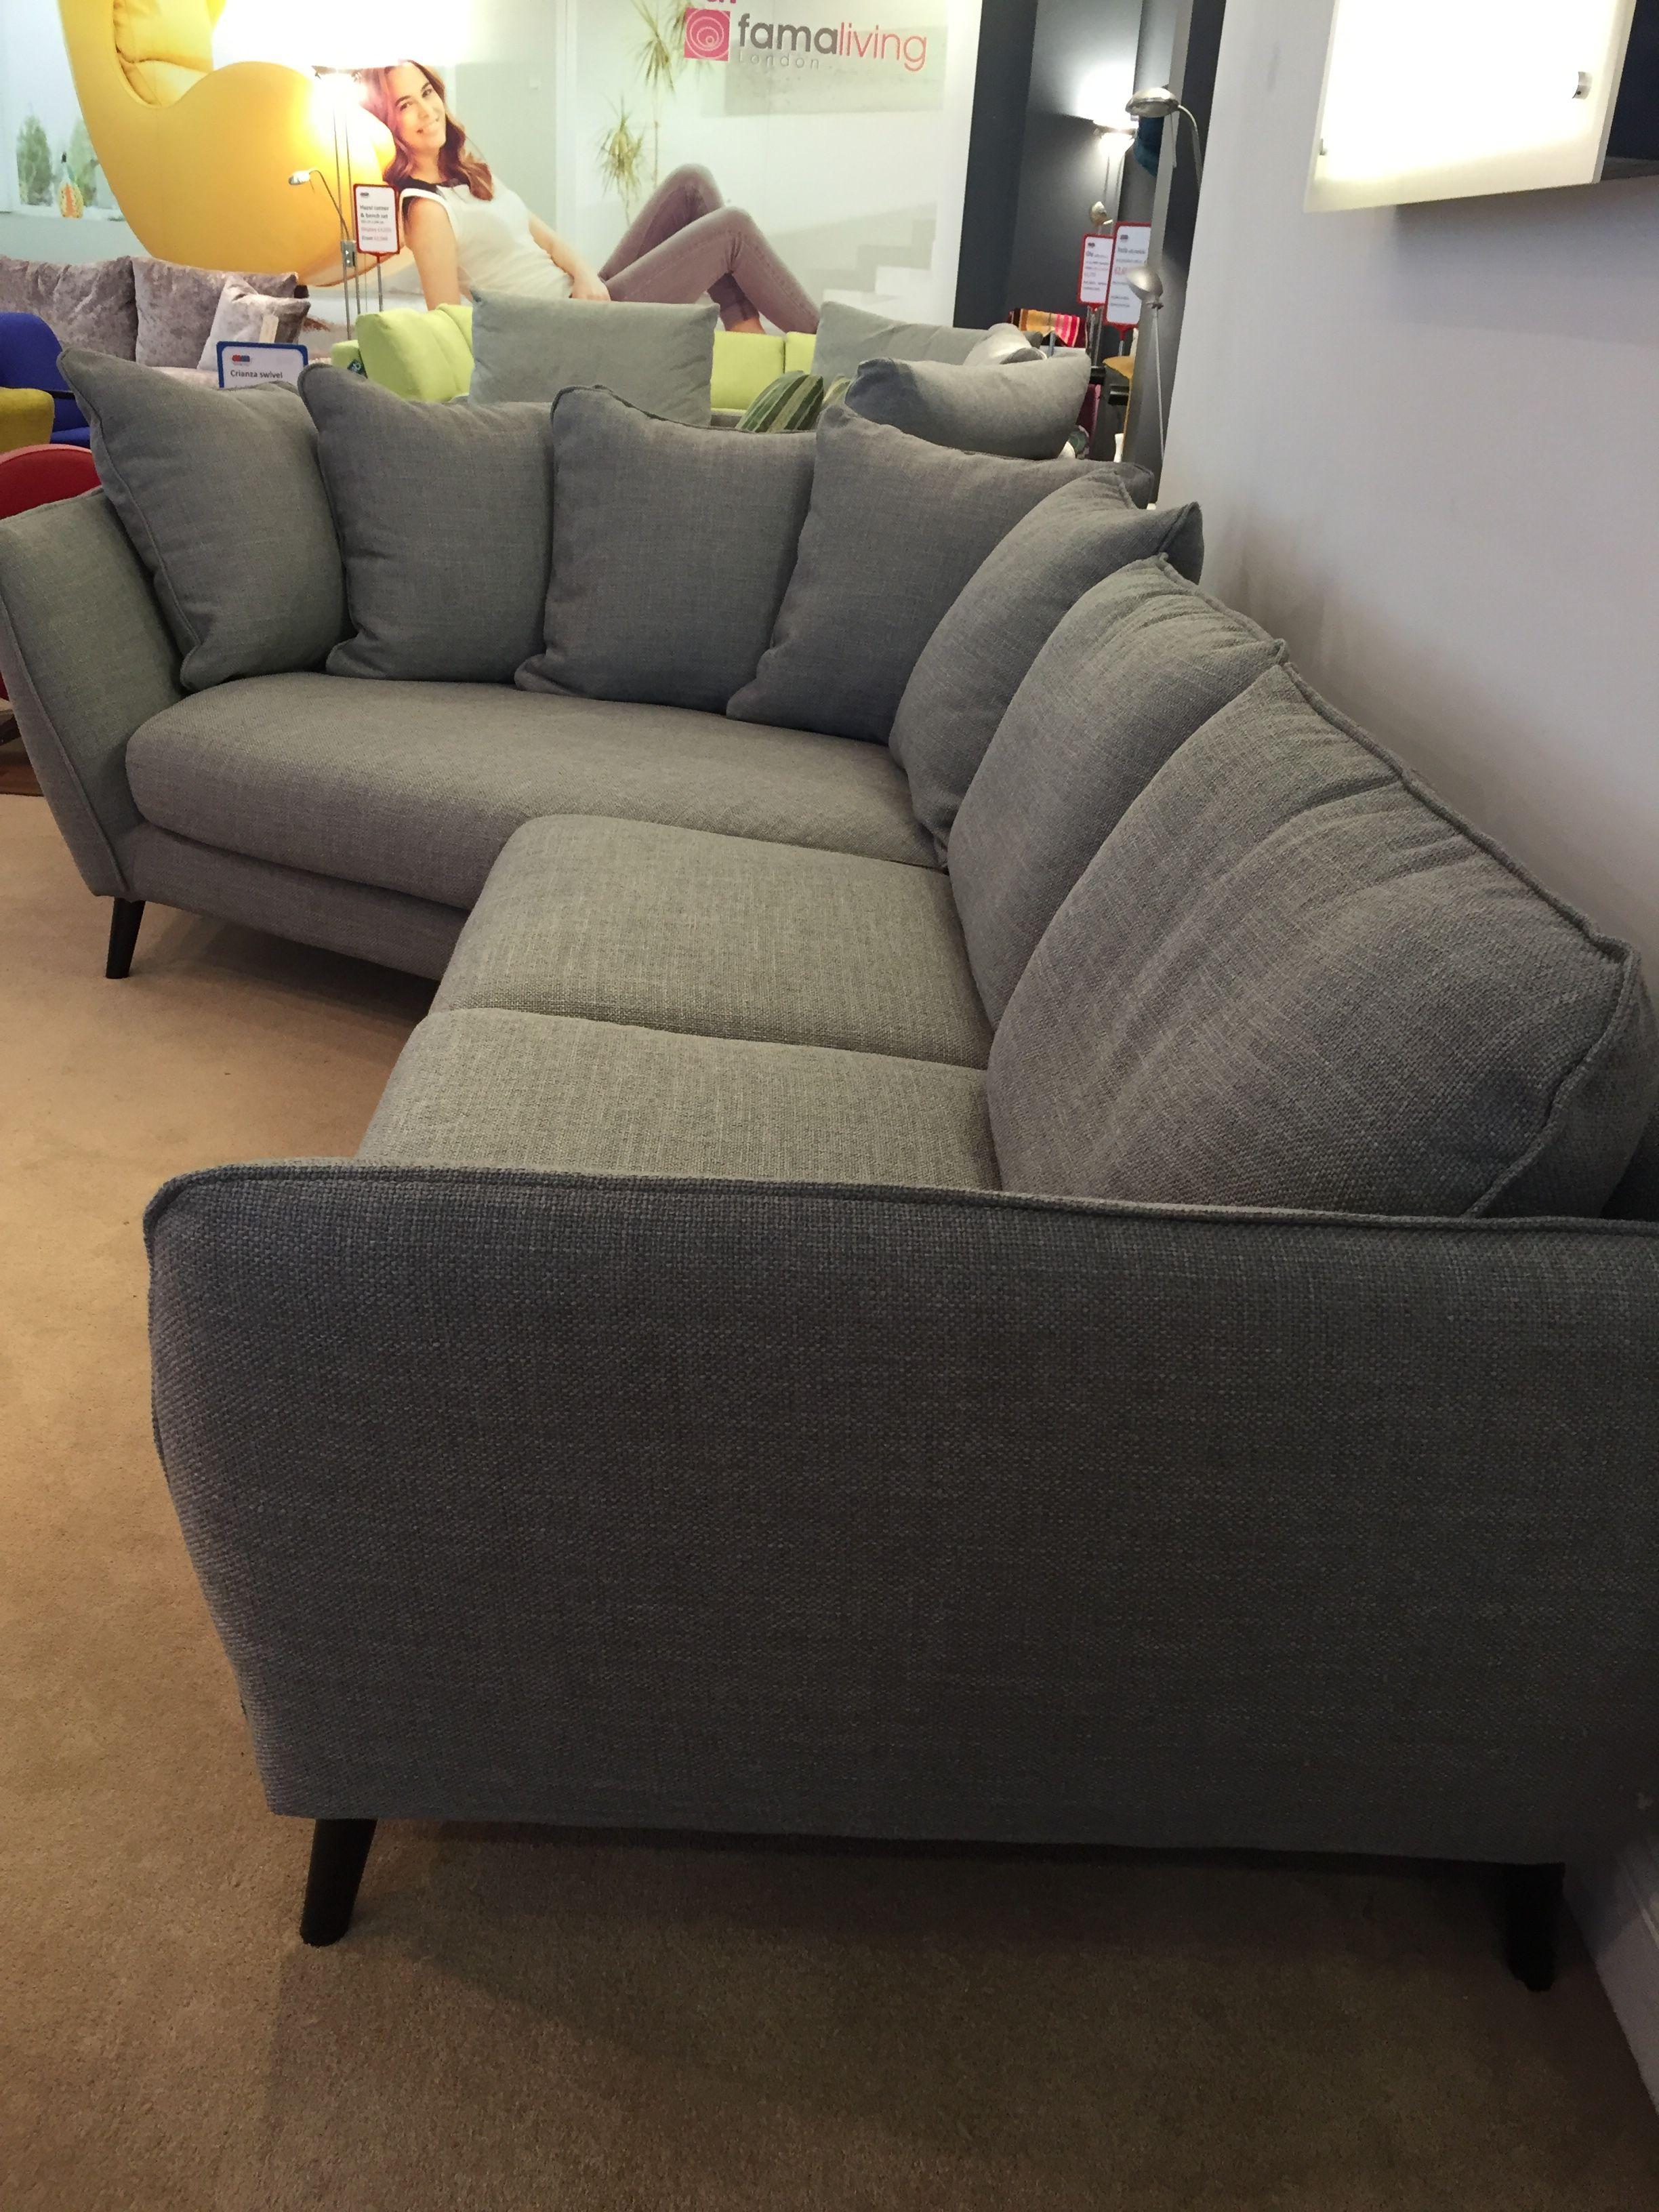 Source New Model Italian Wooden Legs Corner L Shaped Sofa Bed Factory Direct On M Alibaba Com L Shaped Sofa U Shaped Sofa L Shaped Sofa Bed